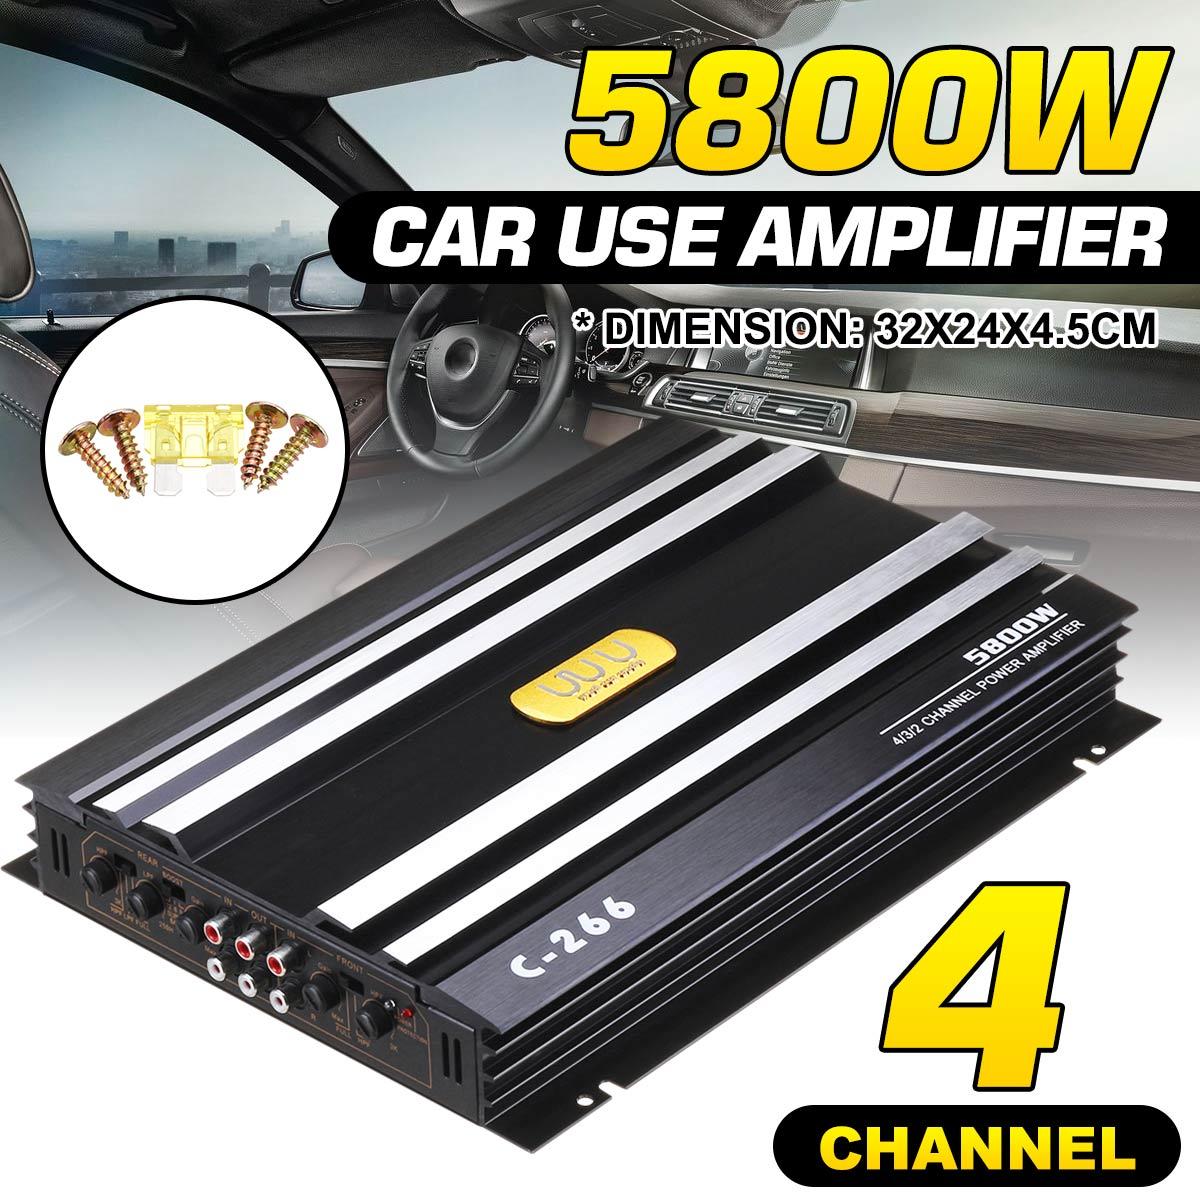 5800W Car Audio Power Amplifier 4 Channel 12V Car Home Digital Amplifer Car Audio Amplifier for Cars